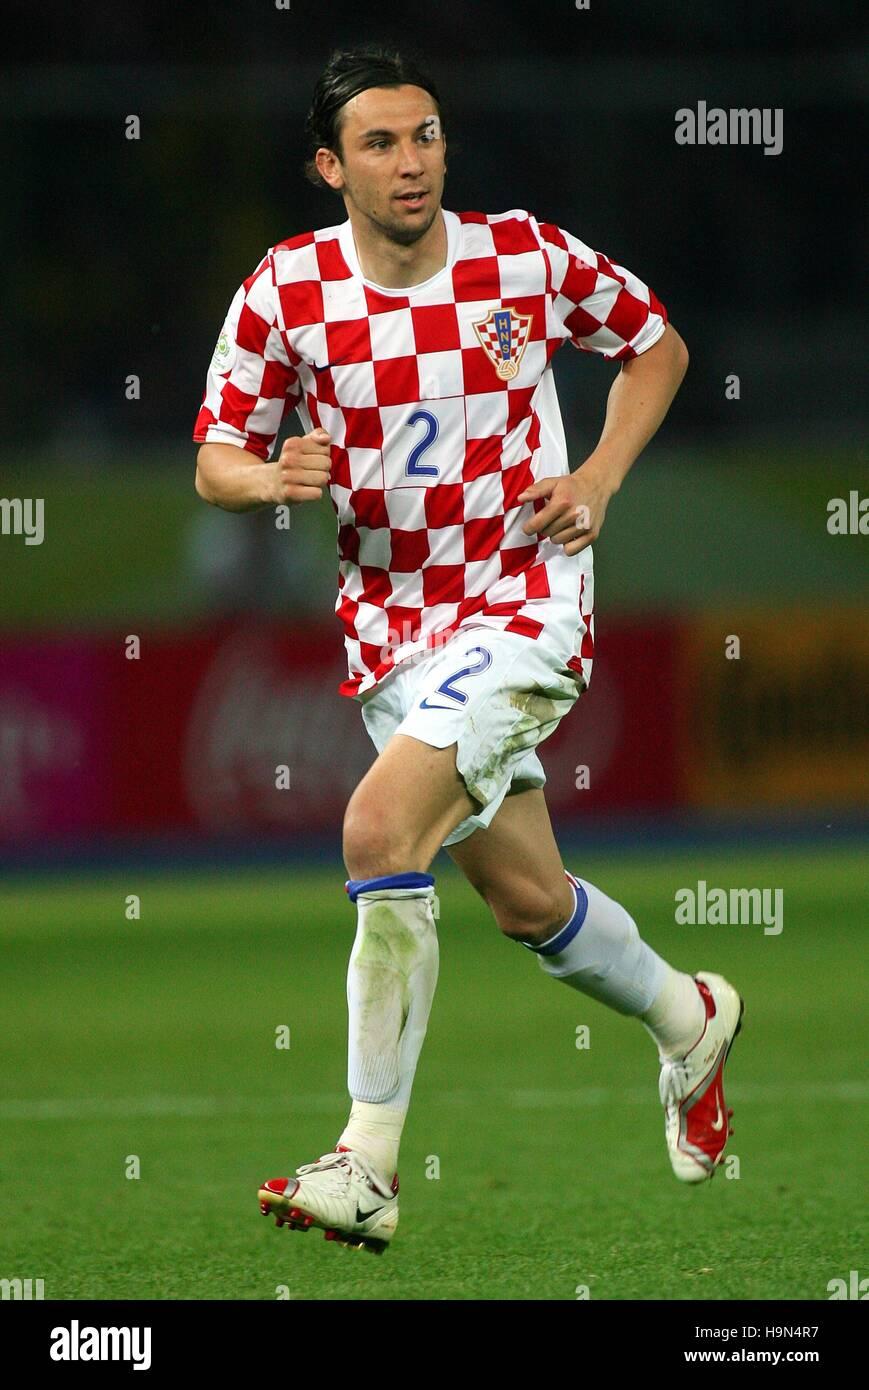 DARIJO SRNA CROATIA & SHAKHTAR DONETSK WORLD CUP BERLIN GERMANY 13